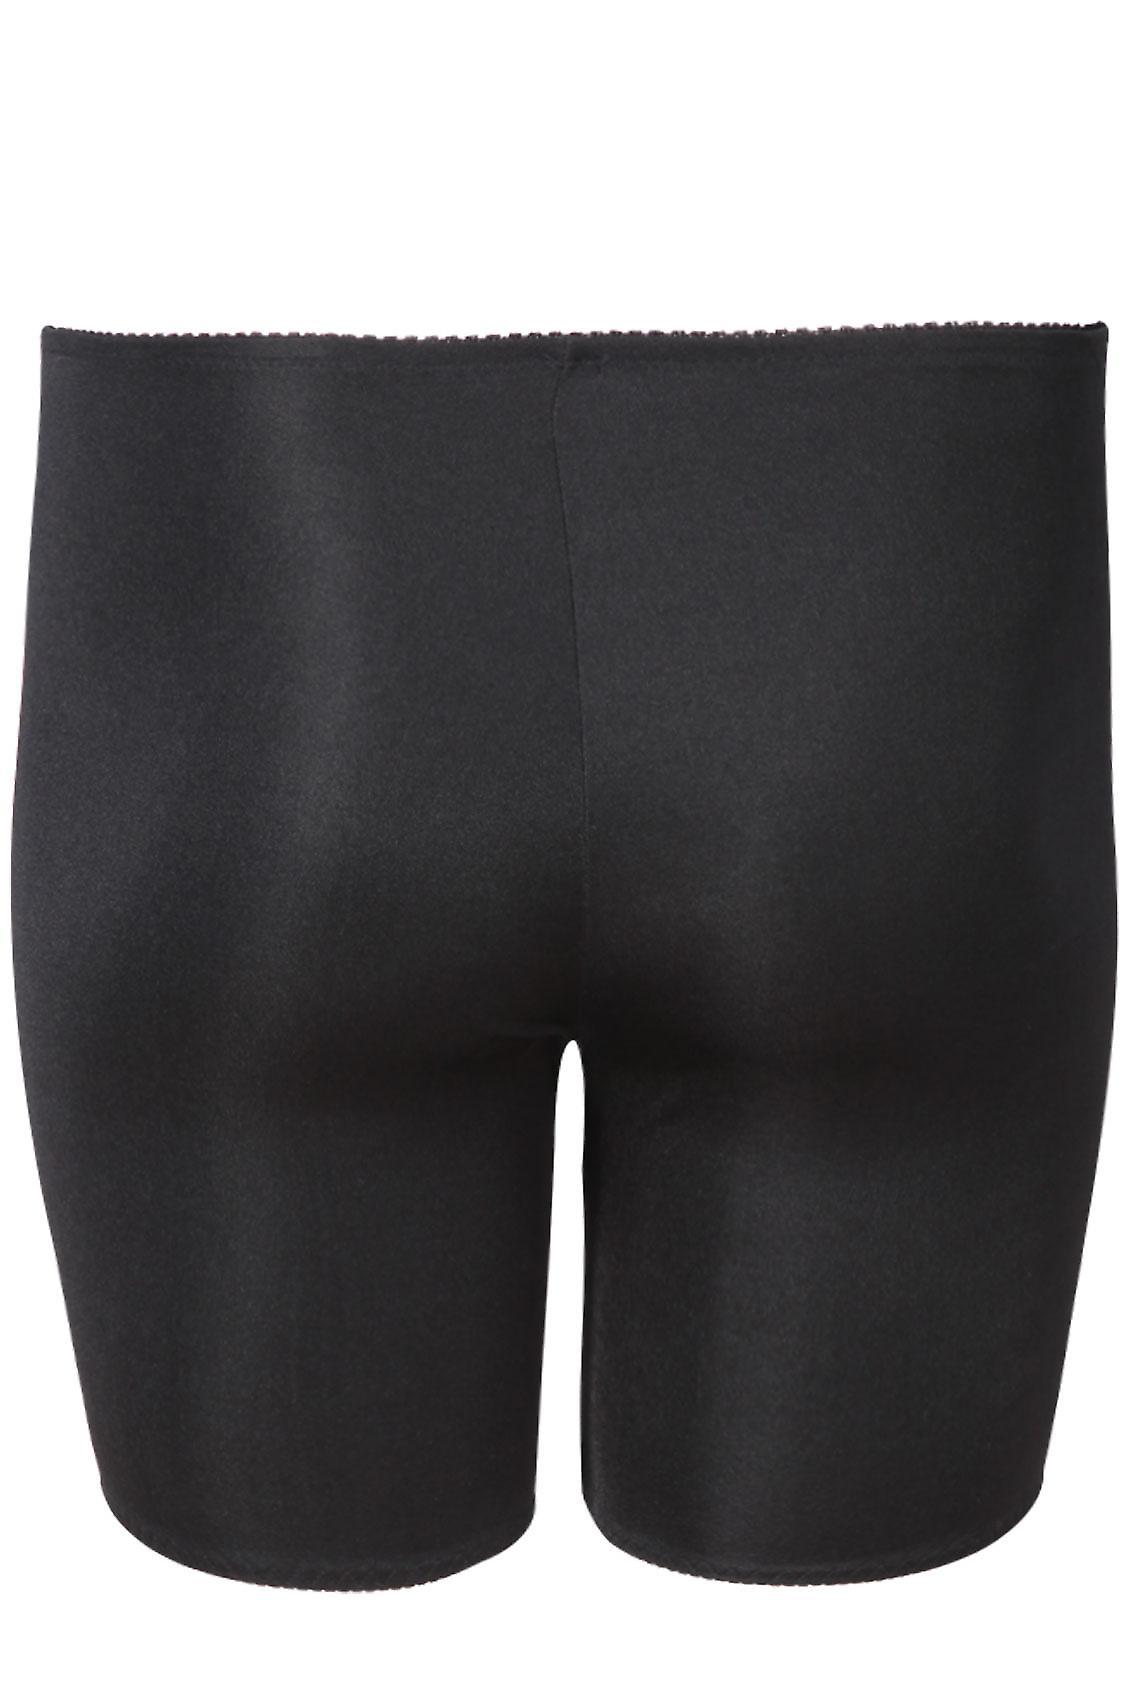 Black Long Leg FIRM CONTROL Body Shaper